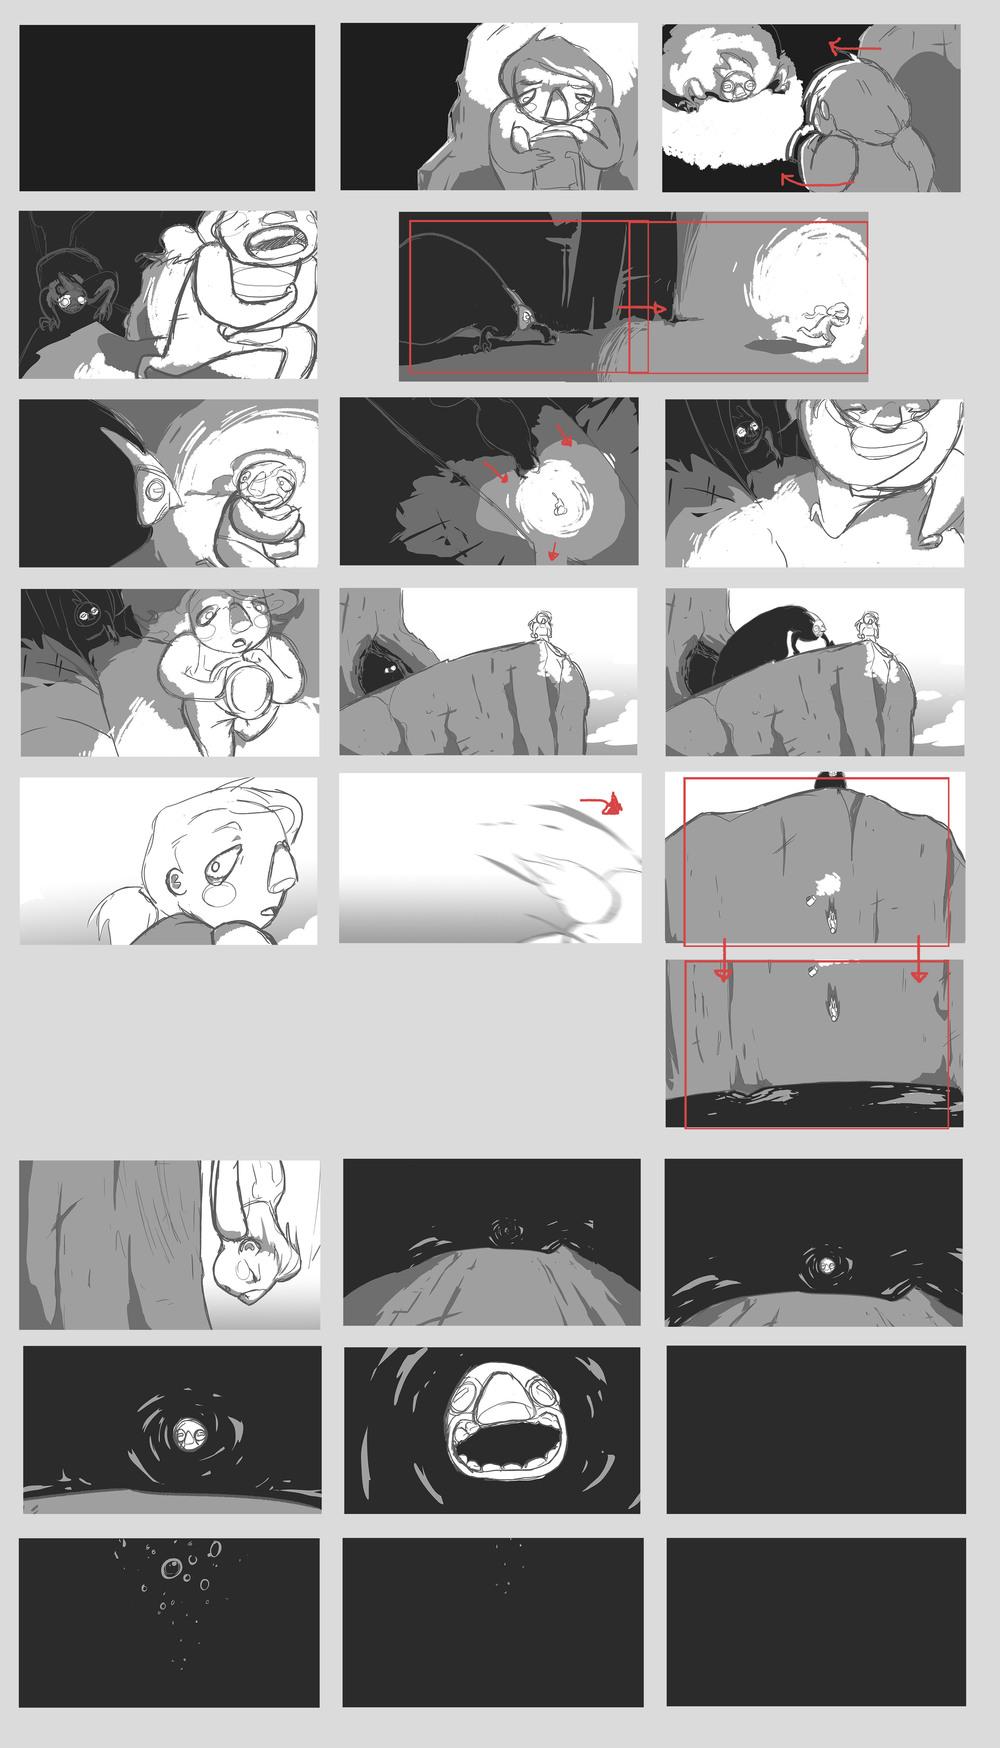 Action_Storyboardss.jpg